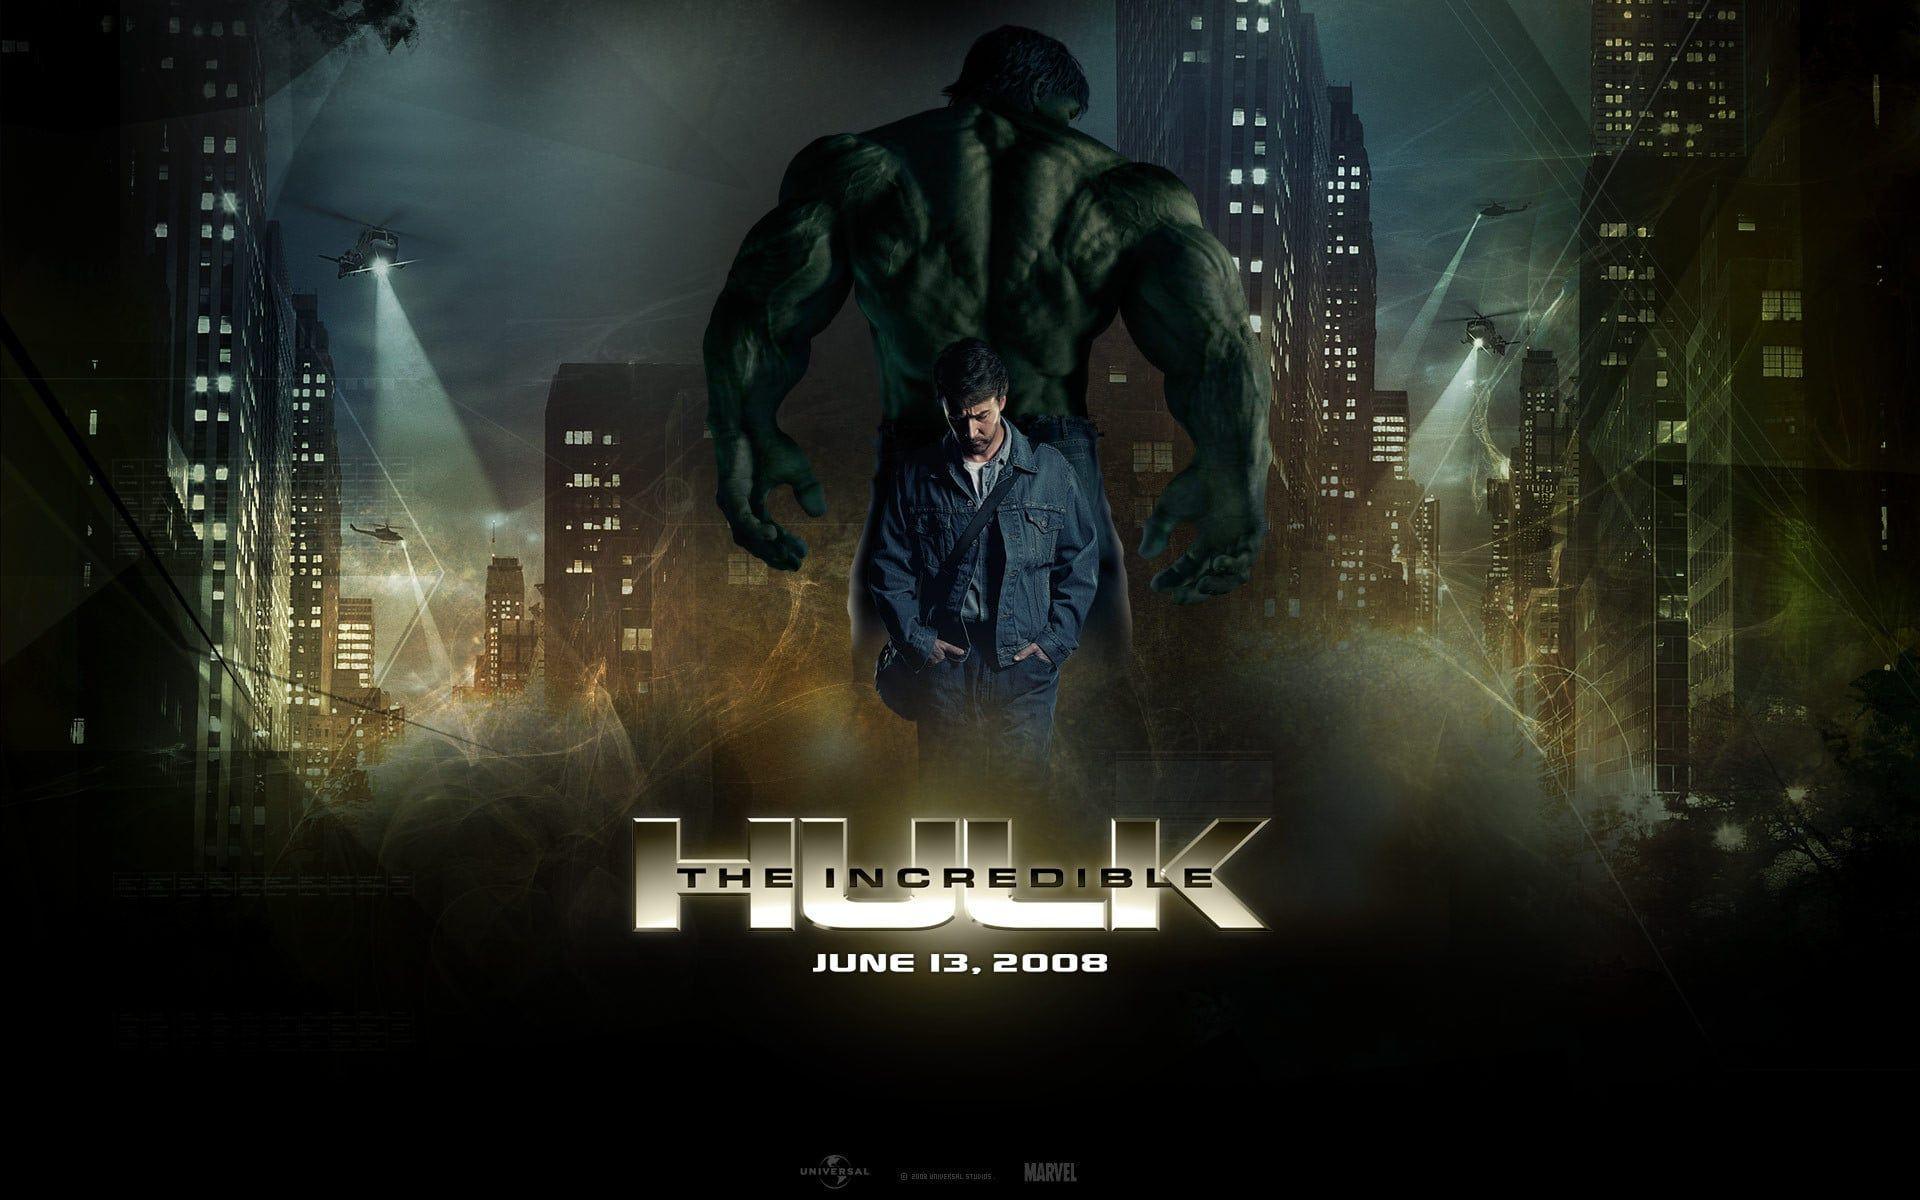 A Hihetetlen Hulk 2008 Online Teljes Film Filmek Magyarul Letoltes Hd Bruce Banner A Tudos Ketsegbeesetten Keresi A Gyogymo Bruce Banner Incredibile Hulk Hulk